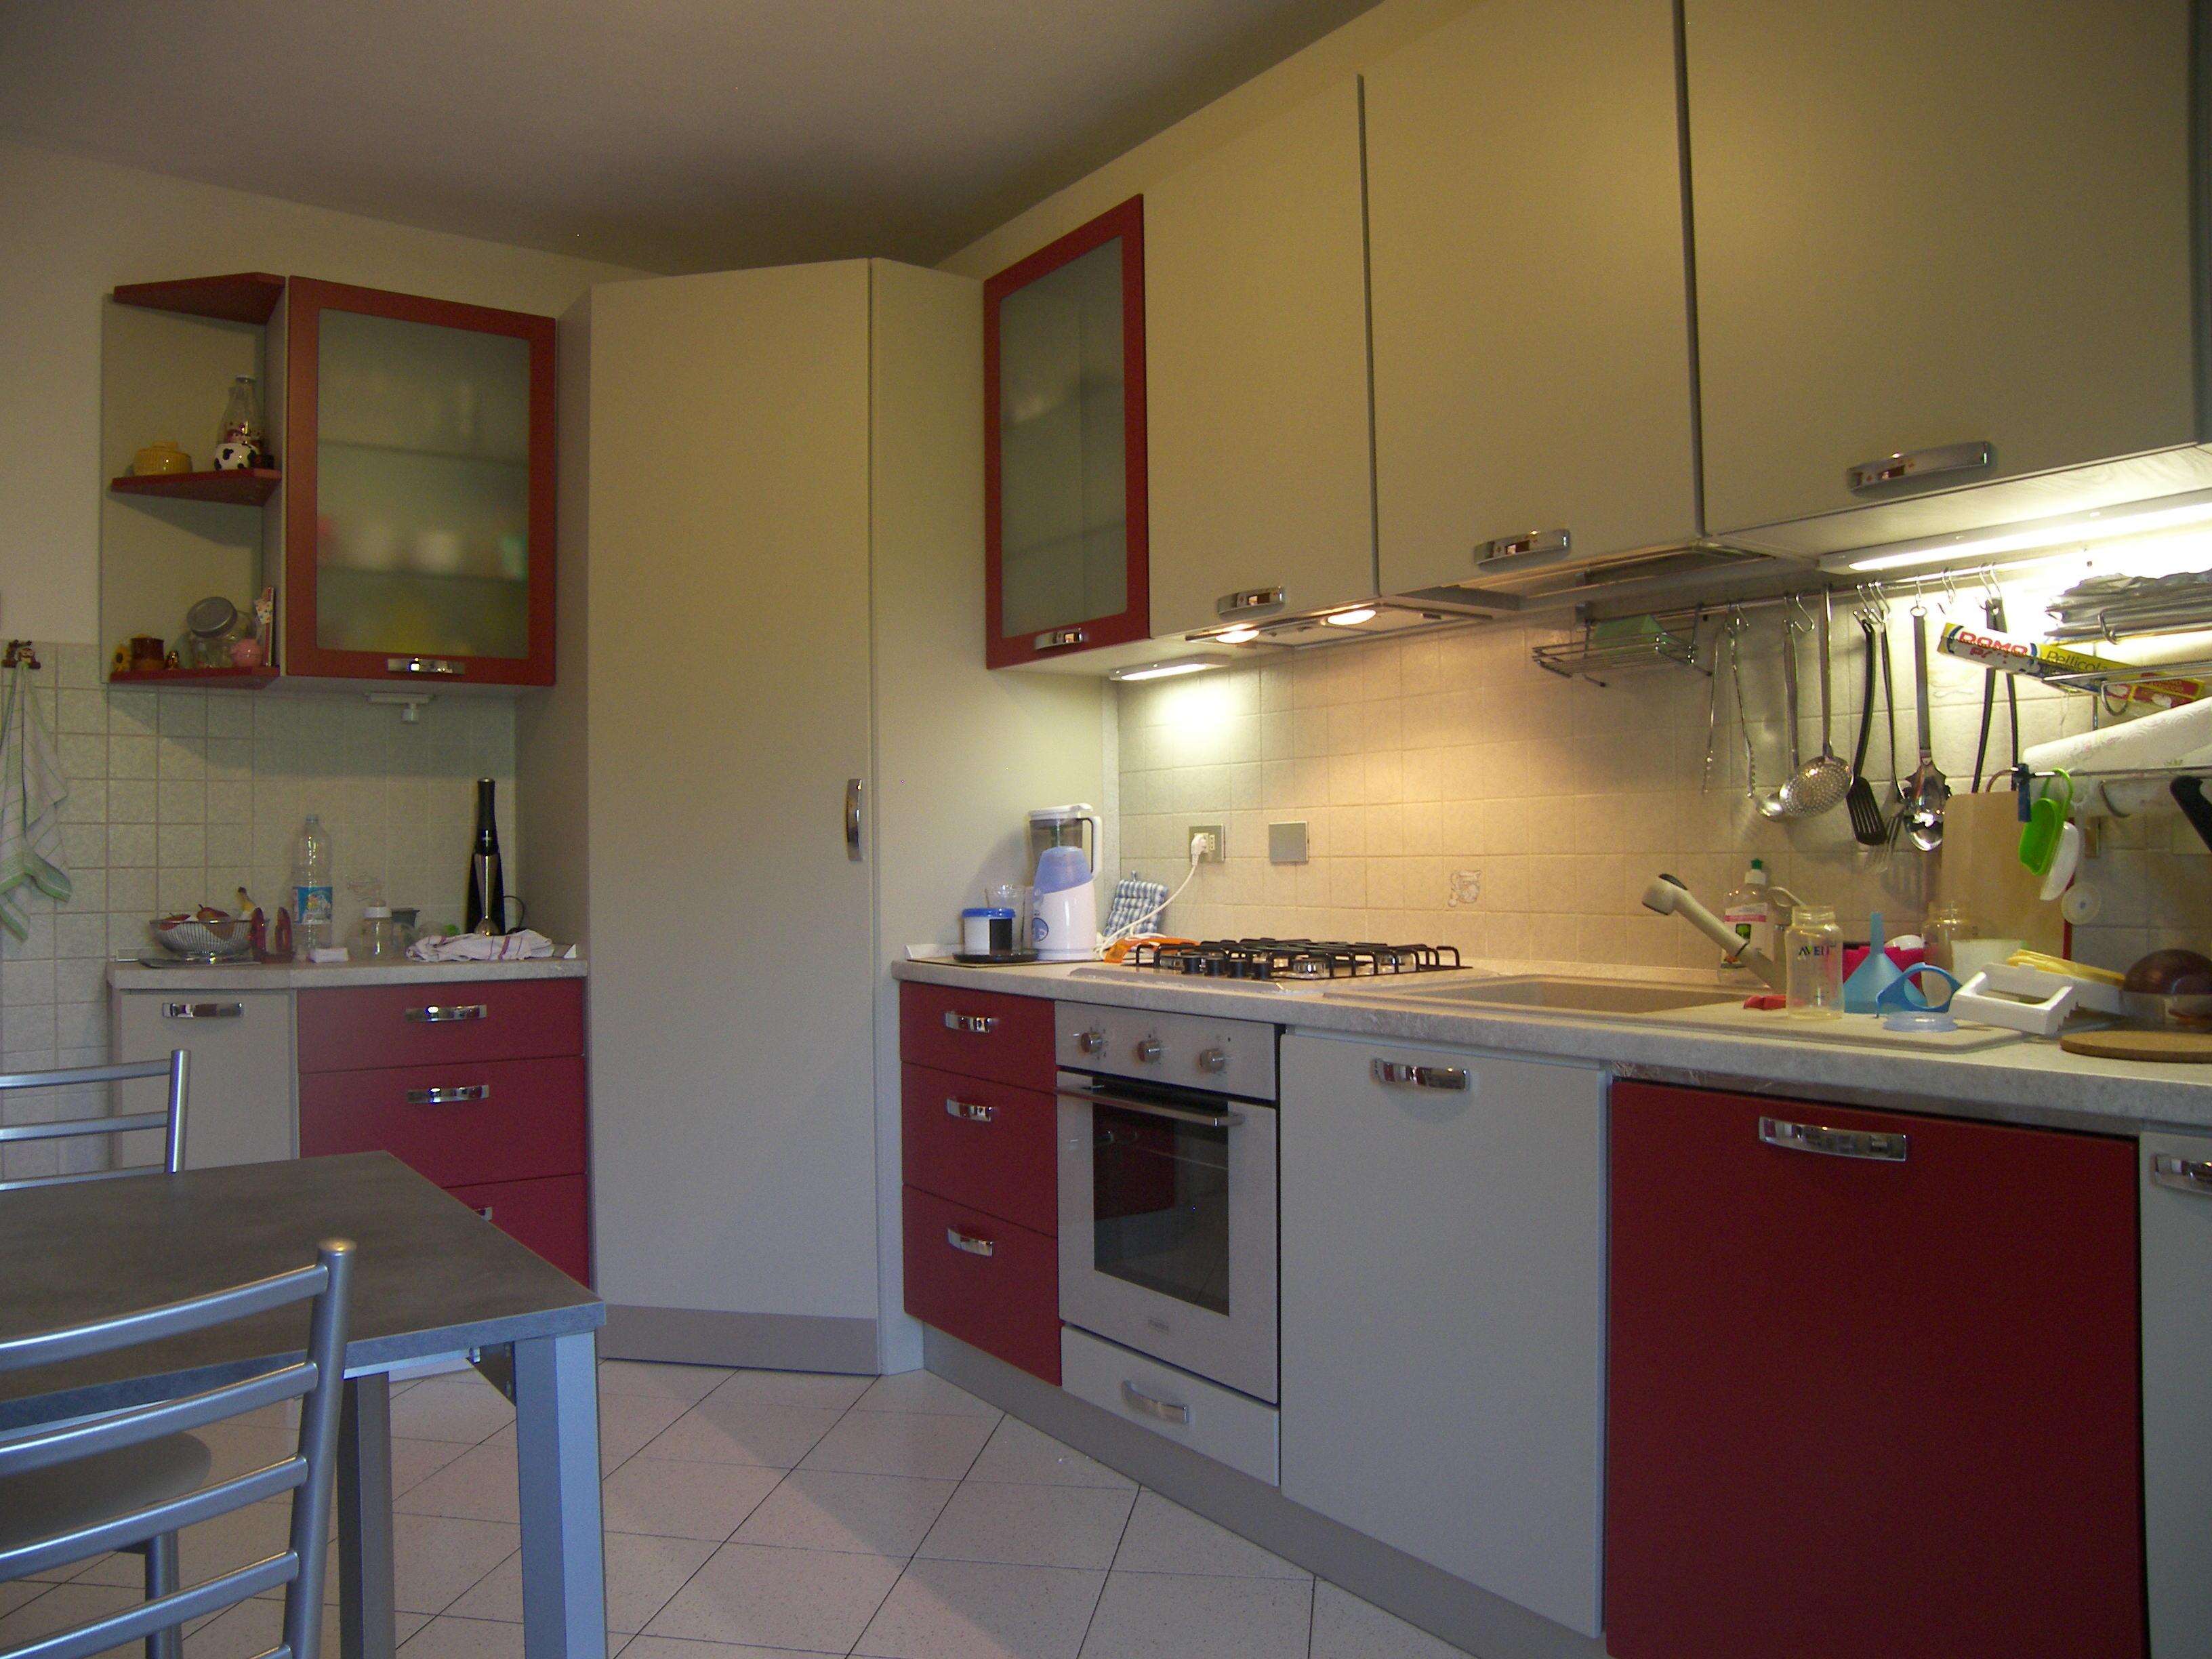 Cucina Soggiorno Ambiente Unico Idee : Cucina soggiorno ambiente ...